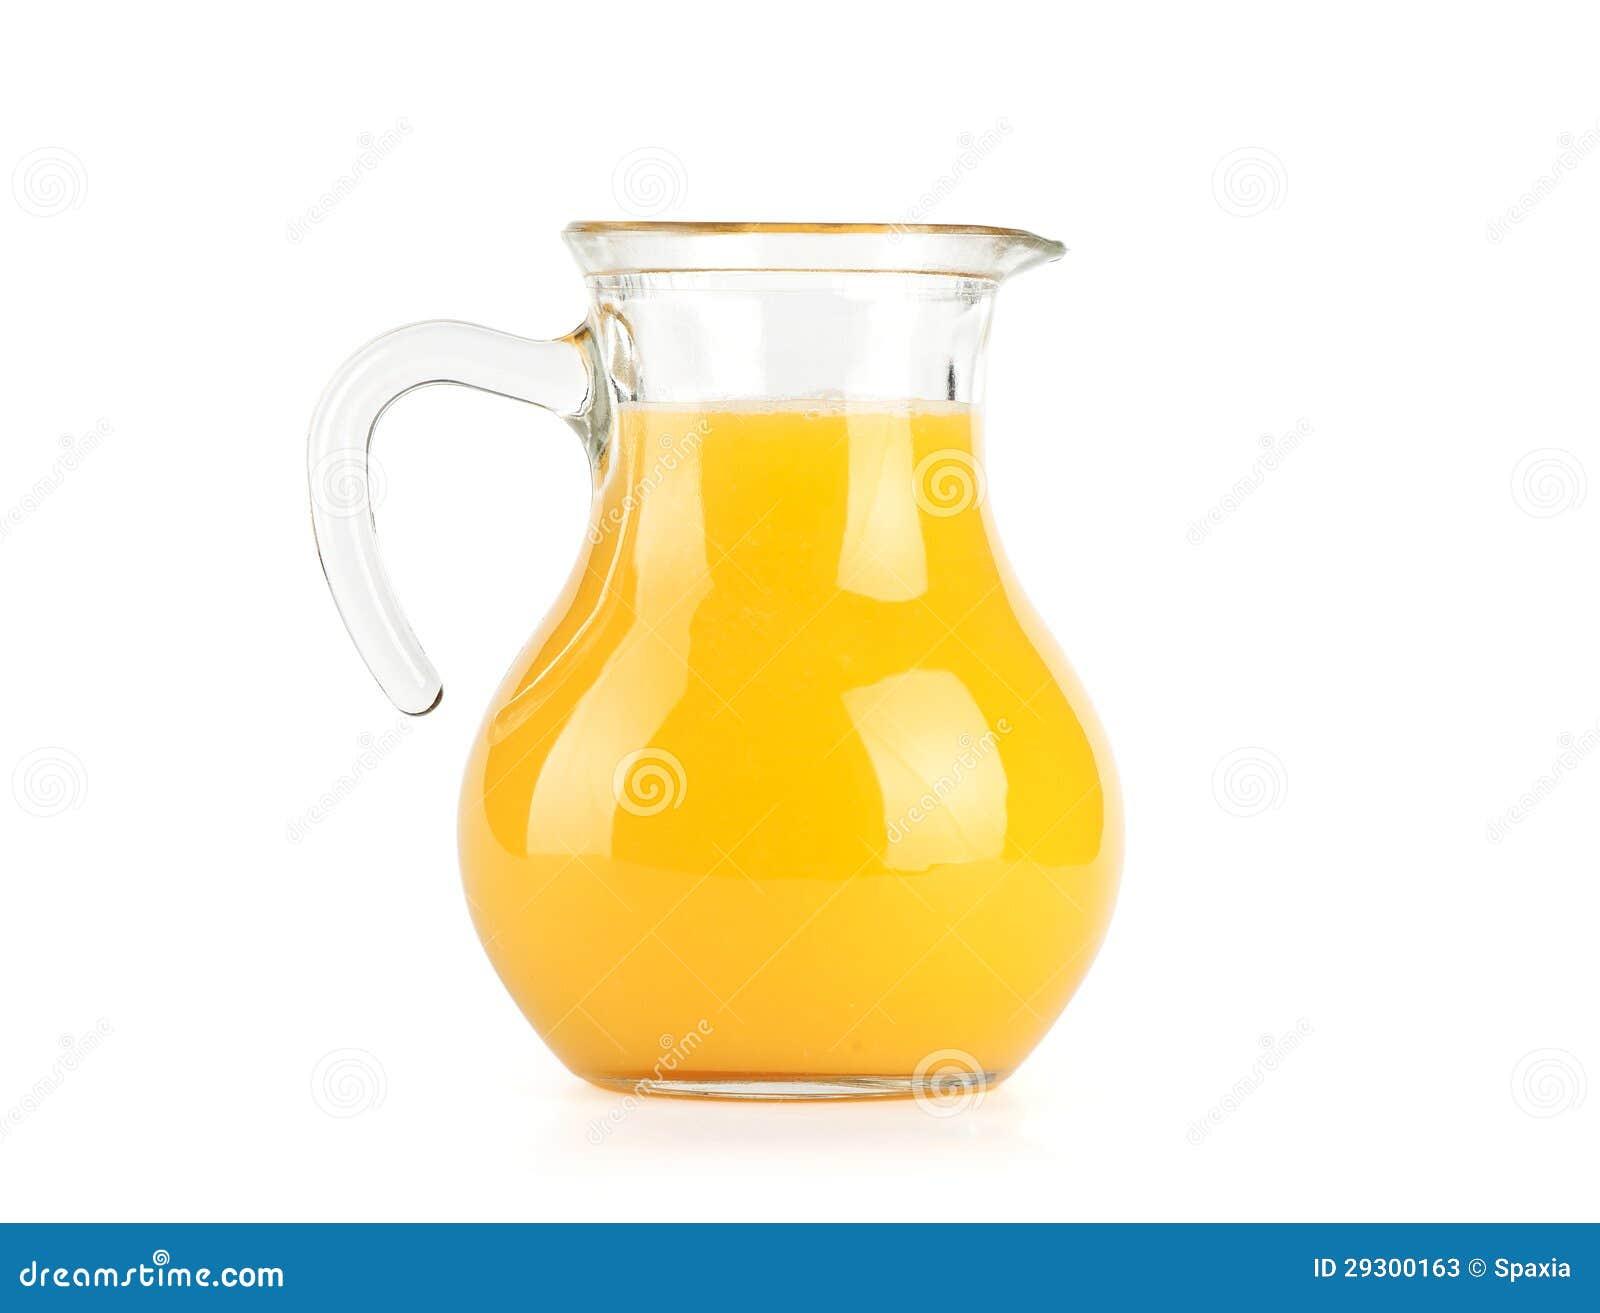 orange juice in pitcher stock photos  image  - juice orange pitcher